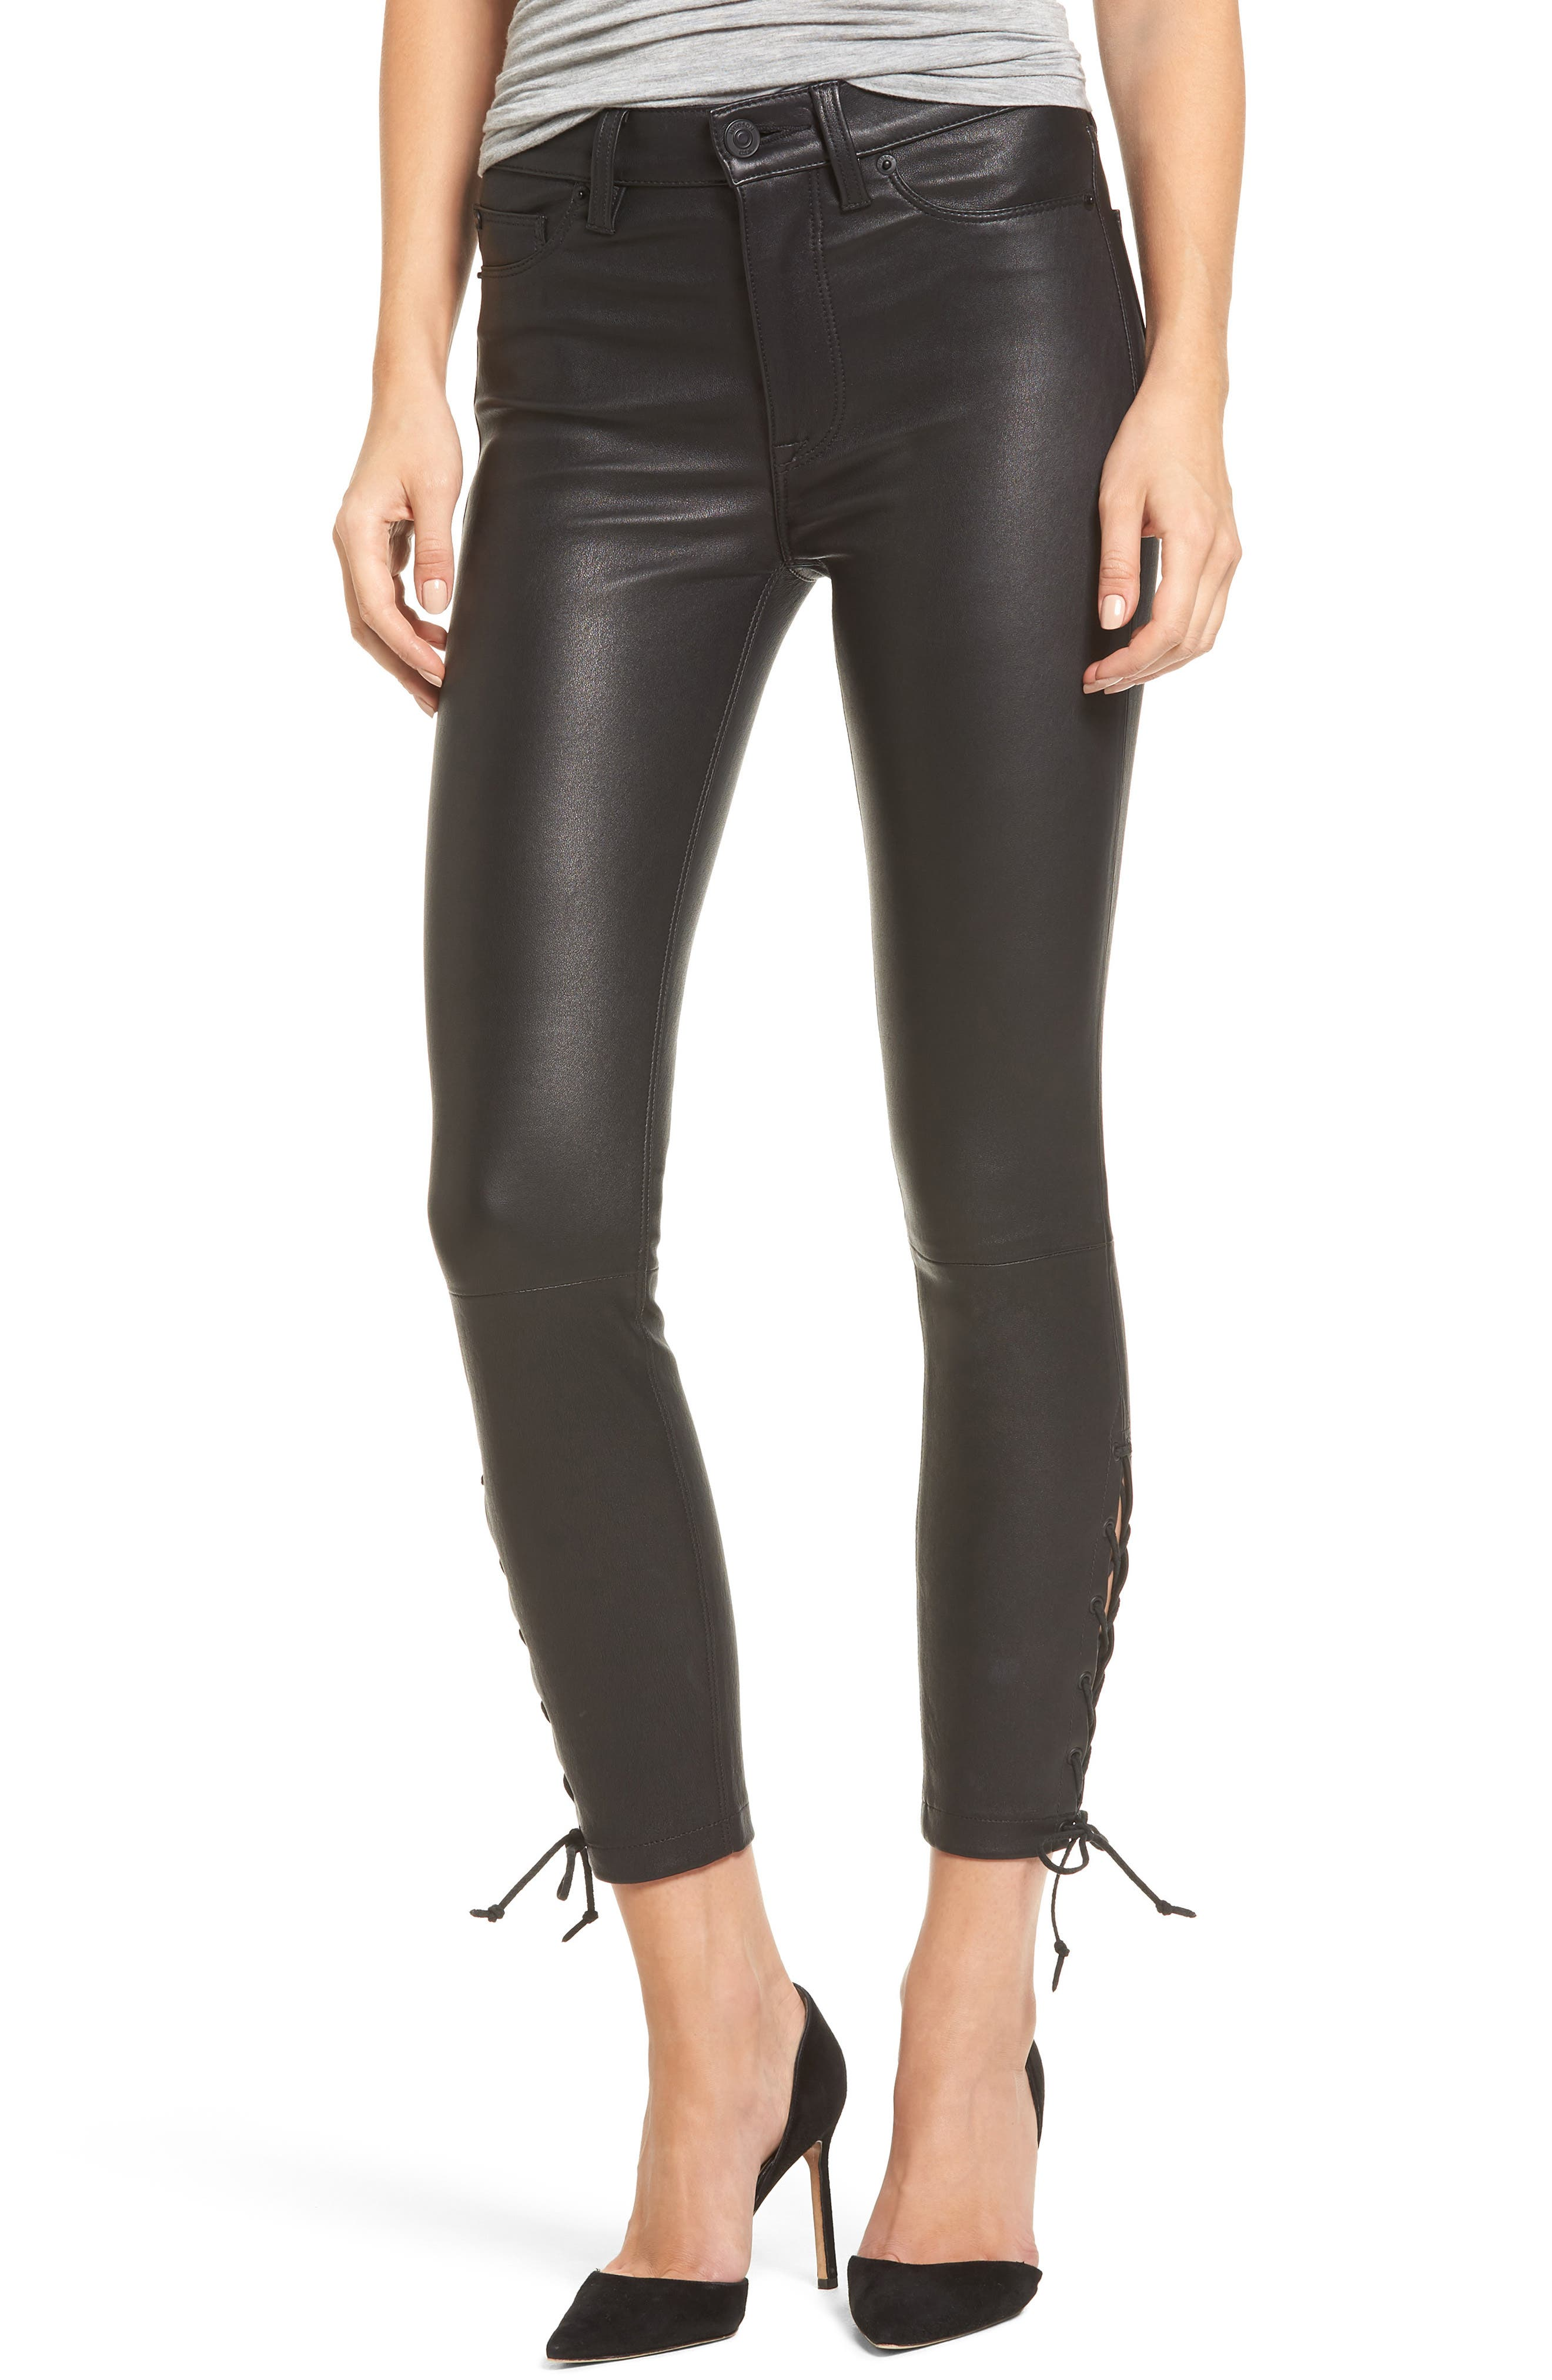 Nix High Waist Leather Skinny Pants,                         Main,                         color, 001